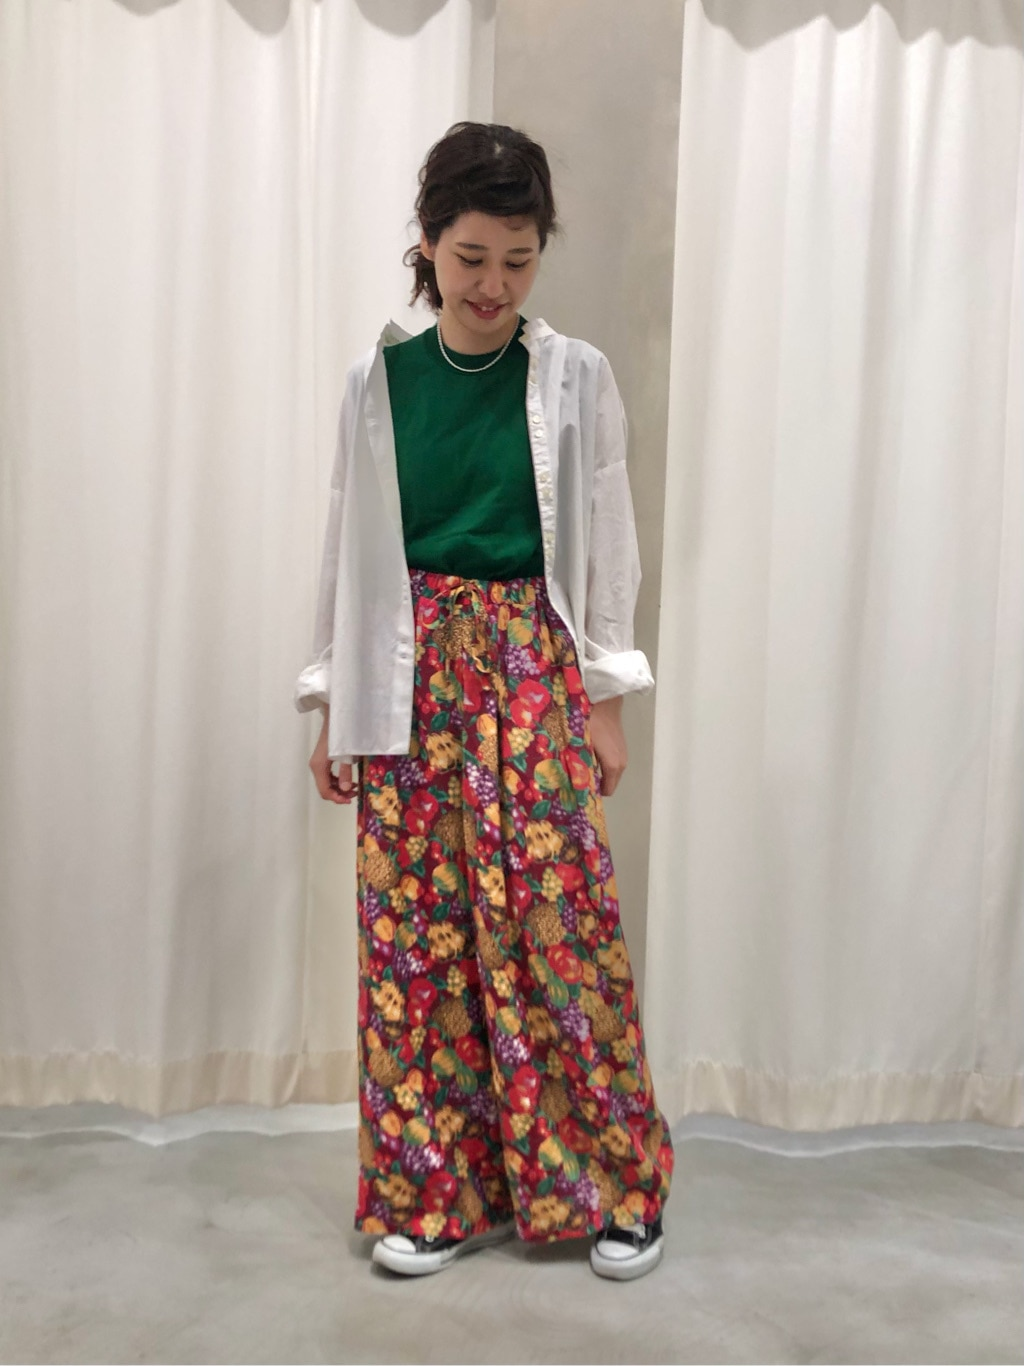 - CHILD WOMAN CHILD WOMAN , PAR ICI 東京スカイツリータウン・ソラマチ 身長:160cm 2021.05.24